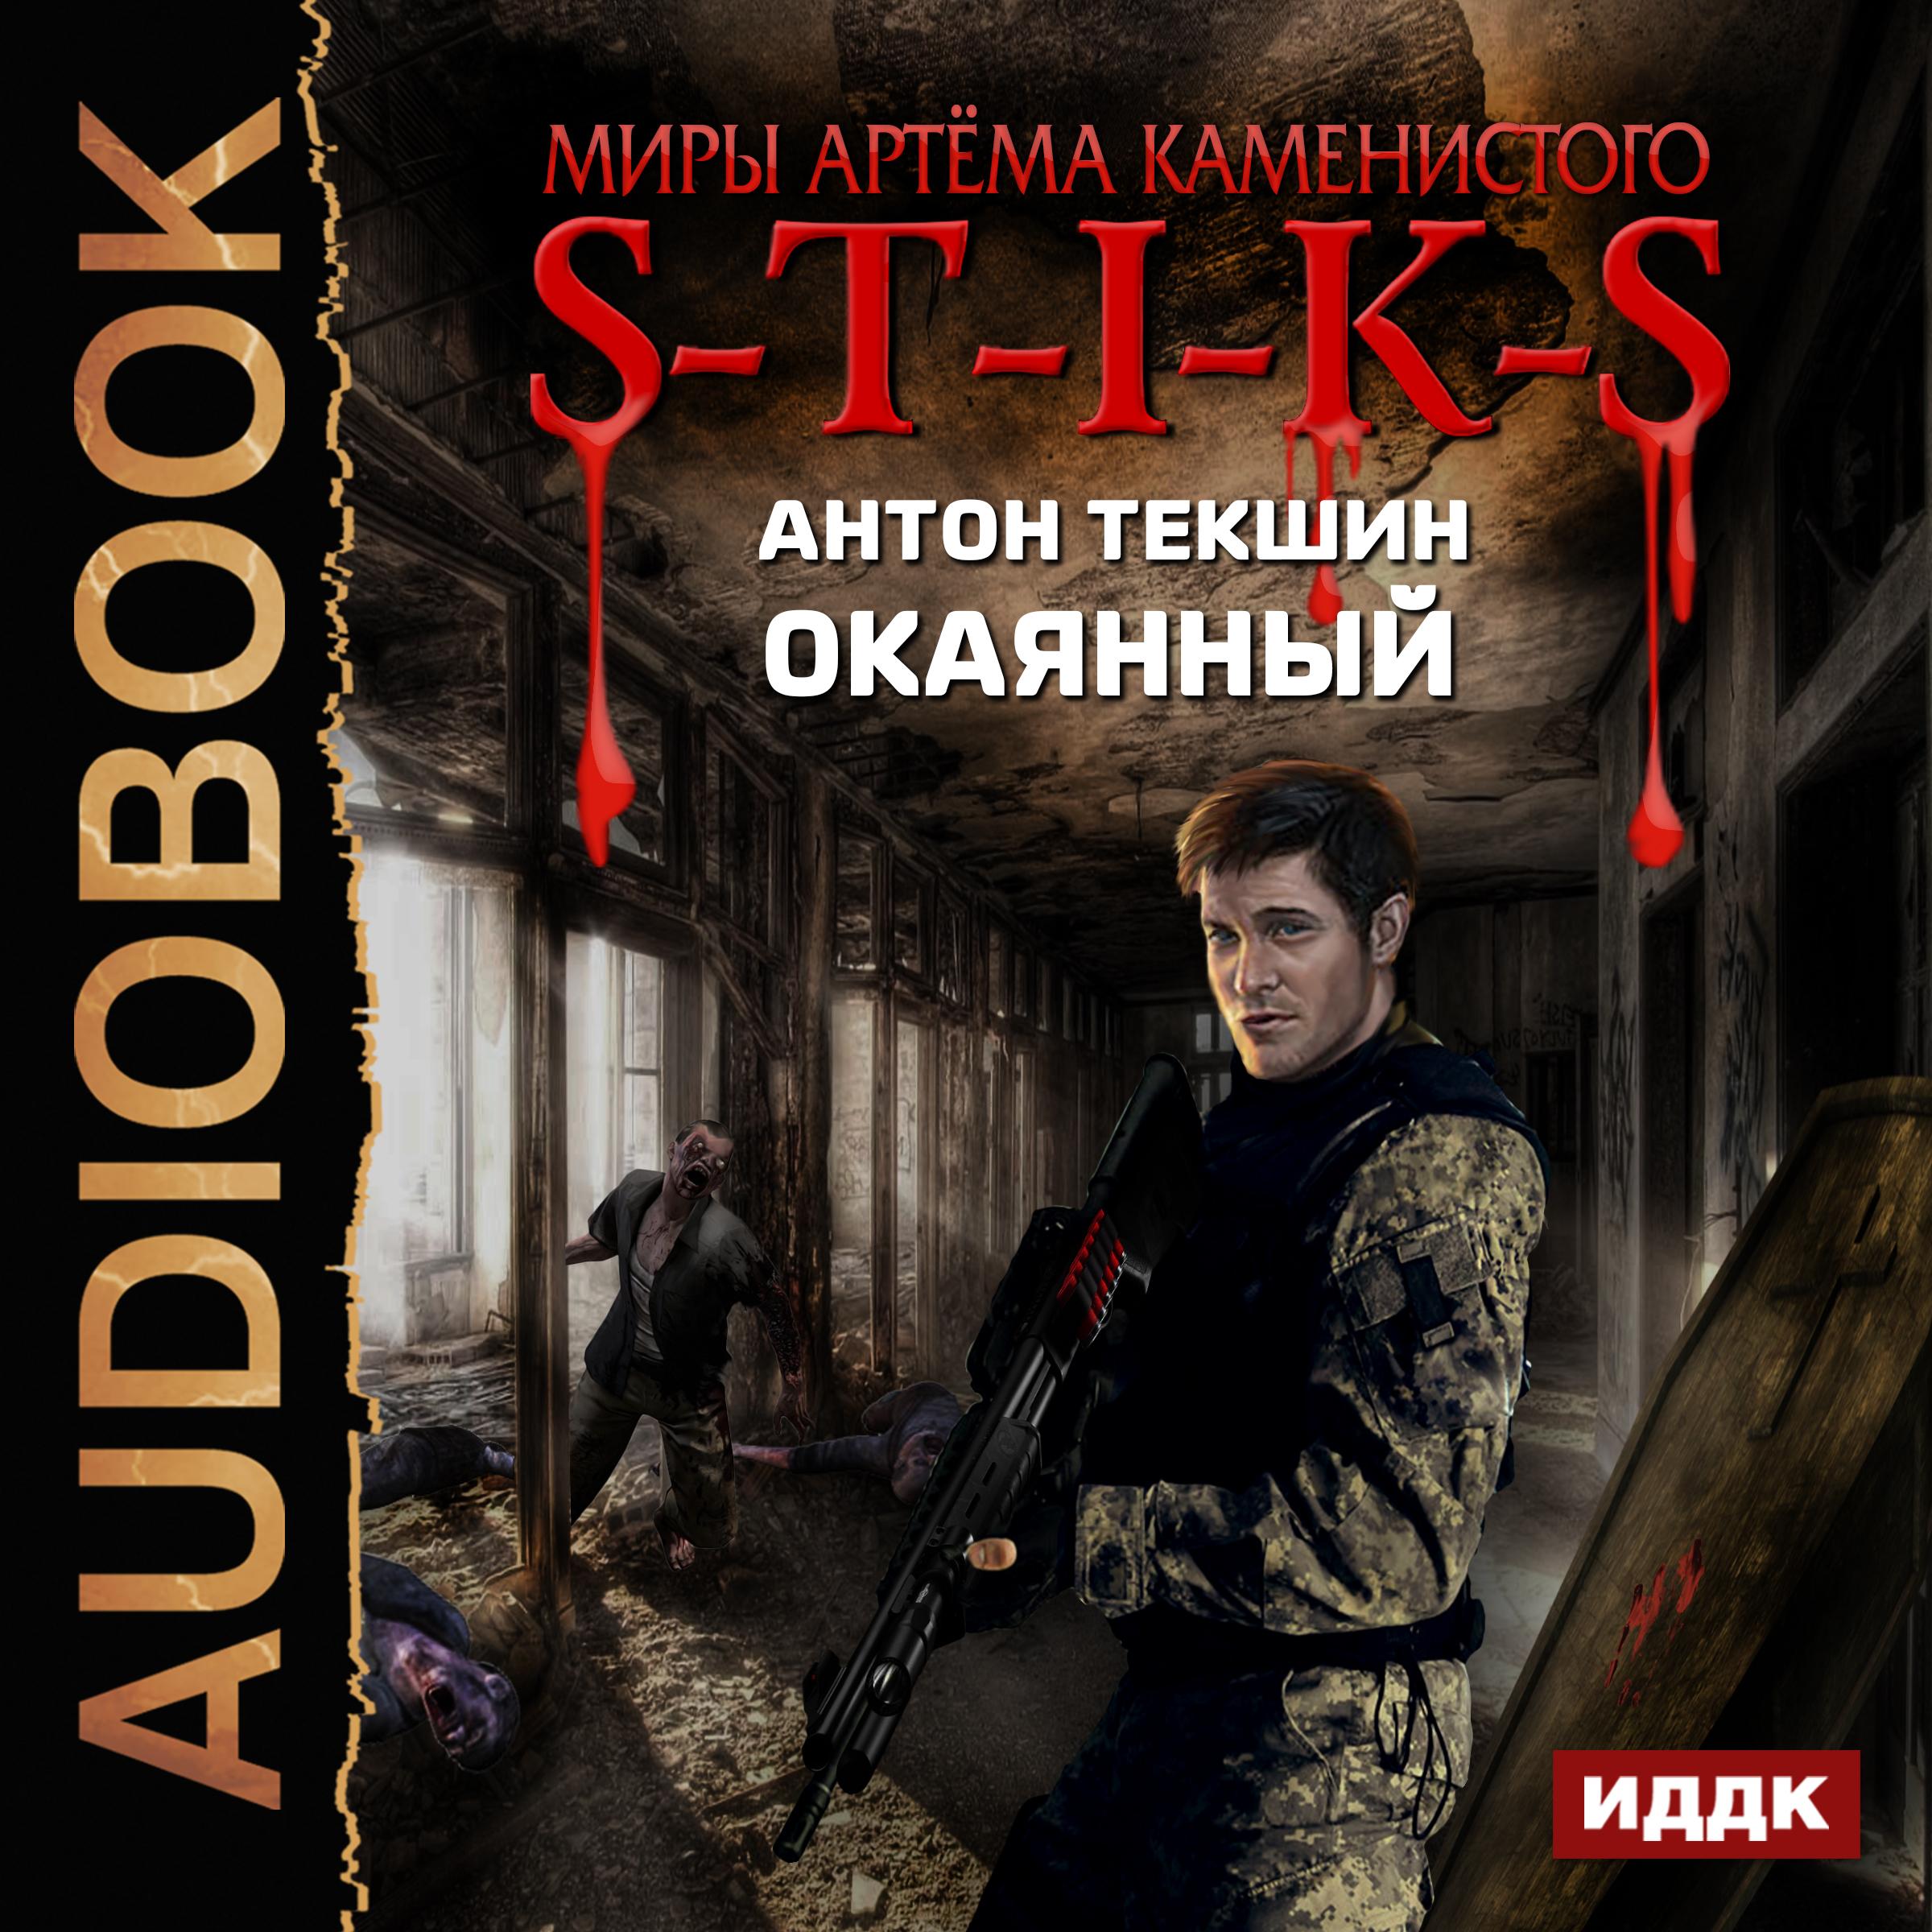 Антон Текшин S-T-I-K-S. Окаянный цена